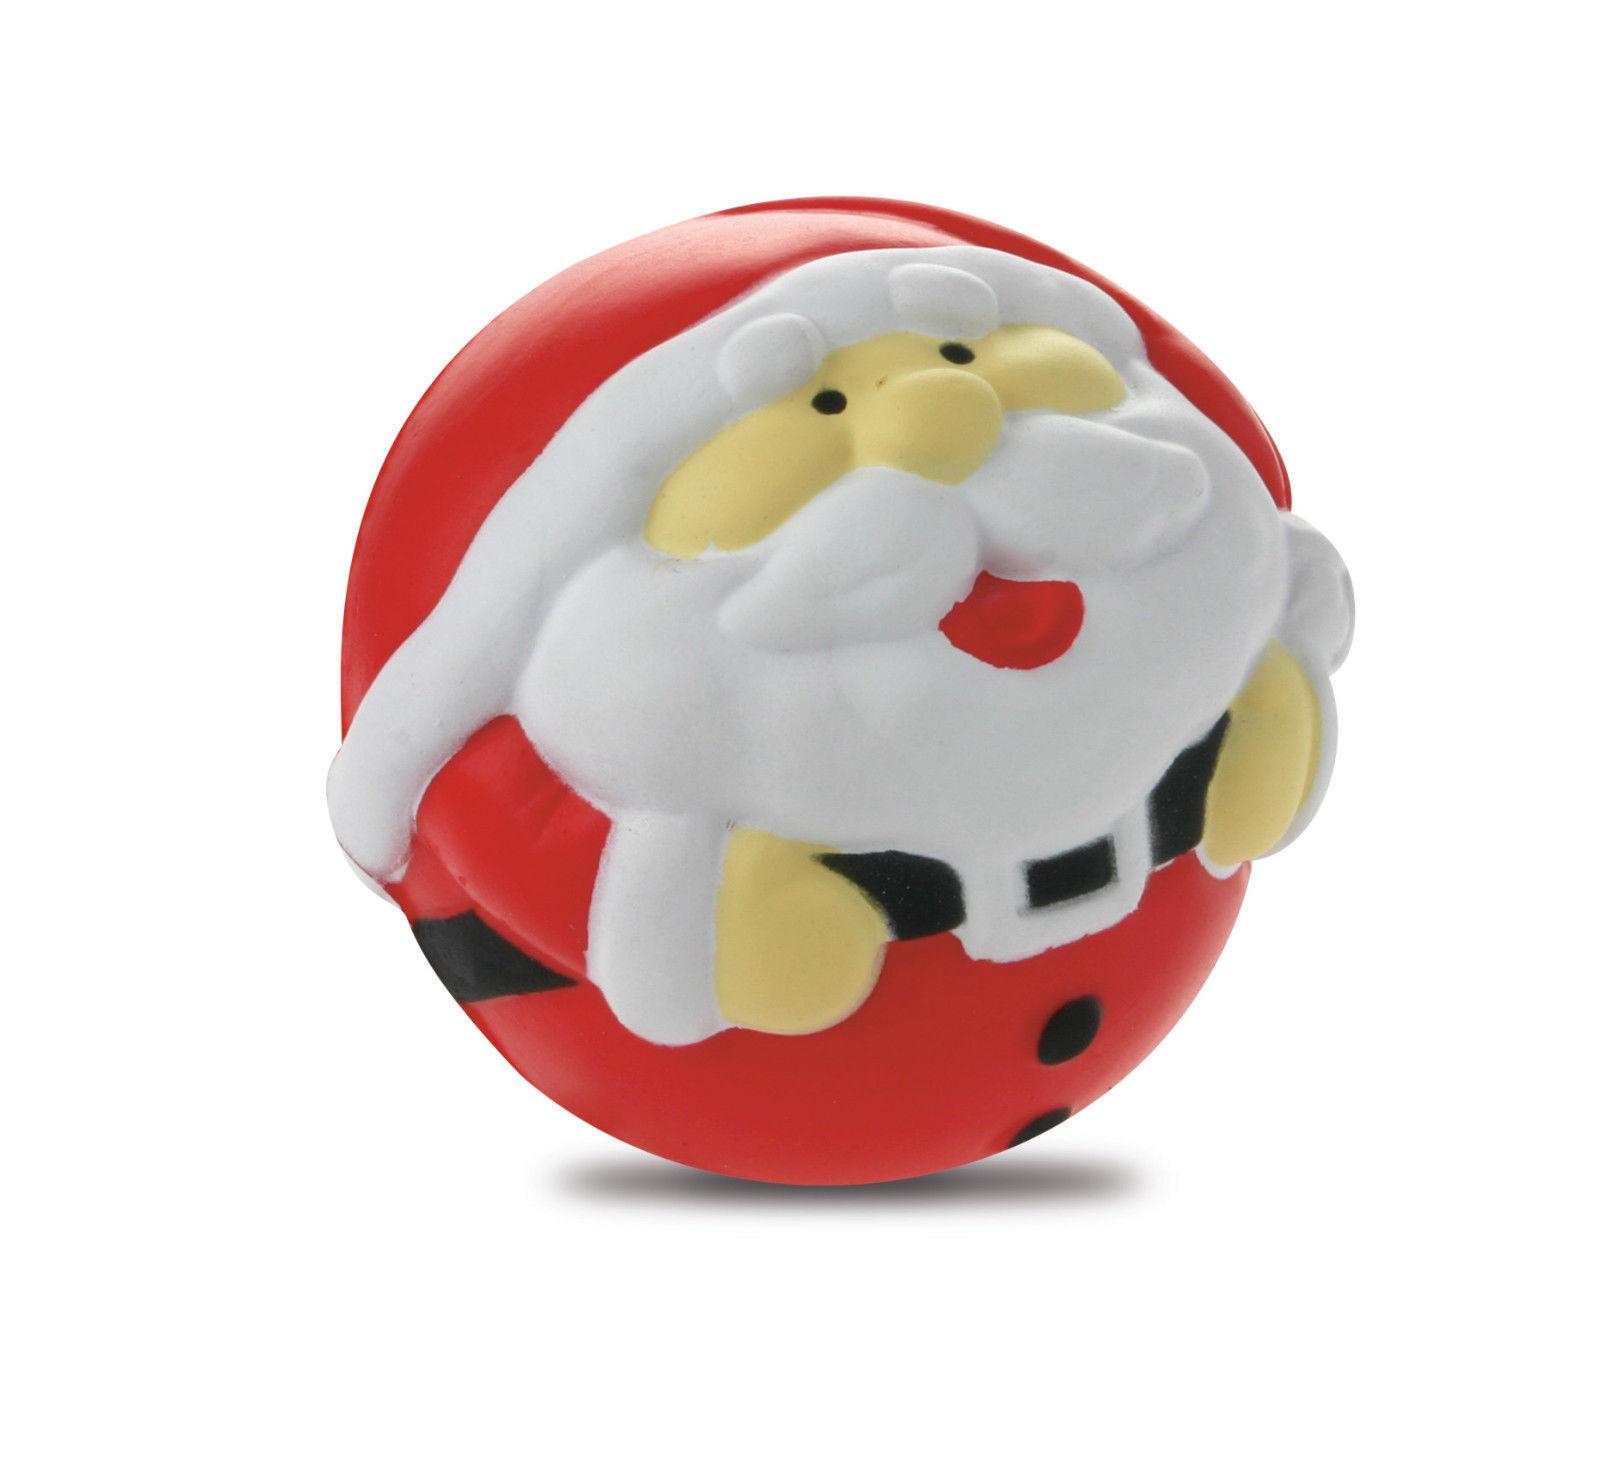 Babbo Natale 50.Stock 50 Gadget 50 Babbo Natale Antistress Idea Regalo Gadget Ingrosso Aziende